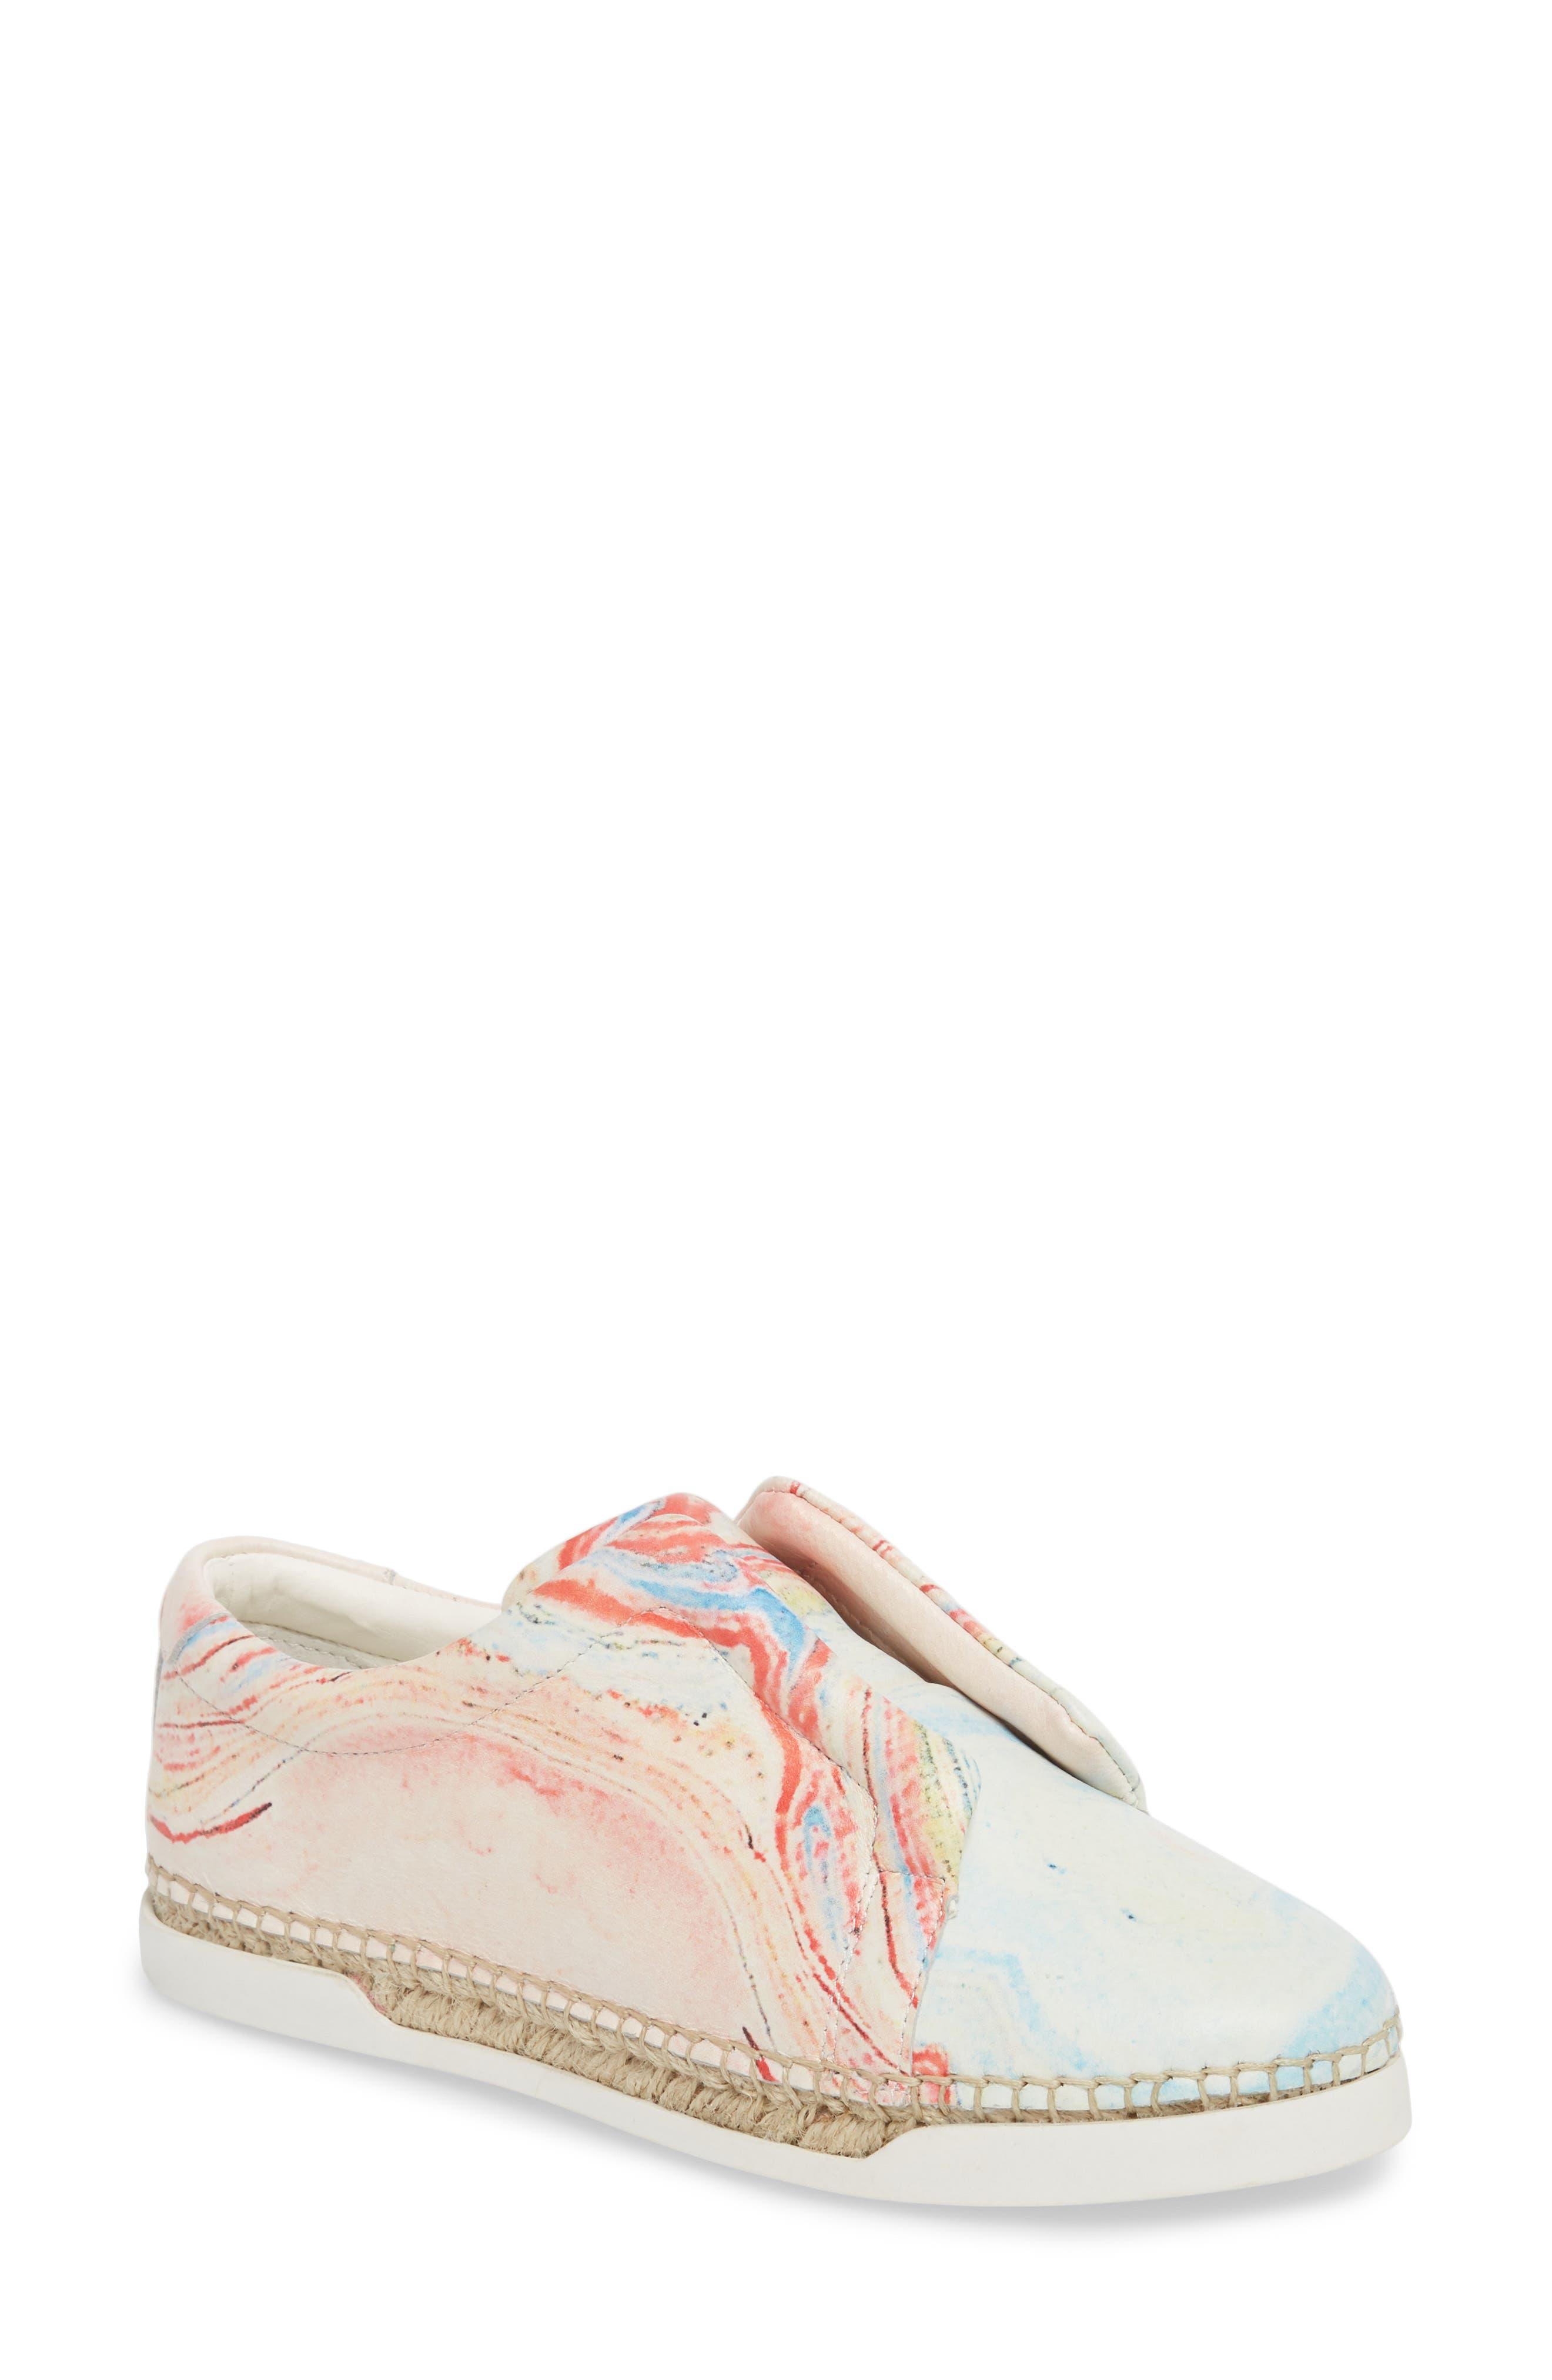 M4D3 Elizabeth Espadrille Slip-On Sneaker- Black